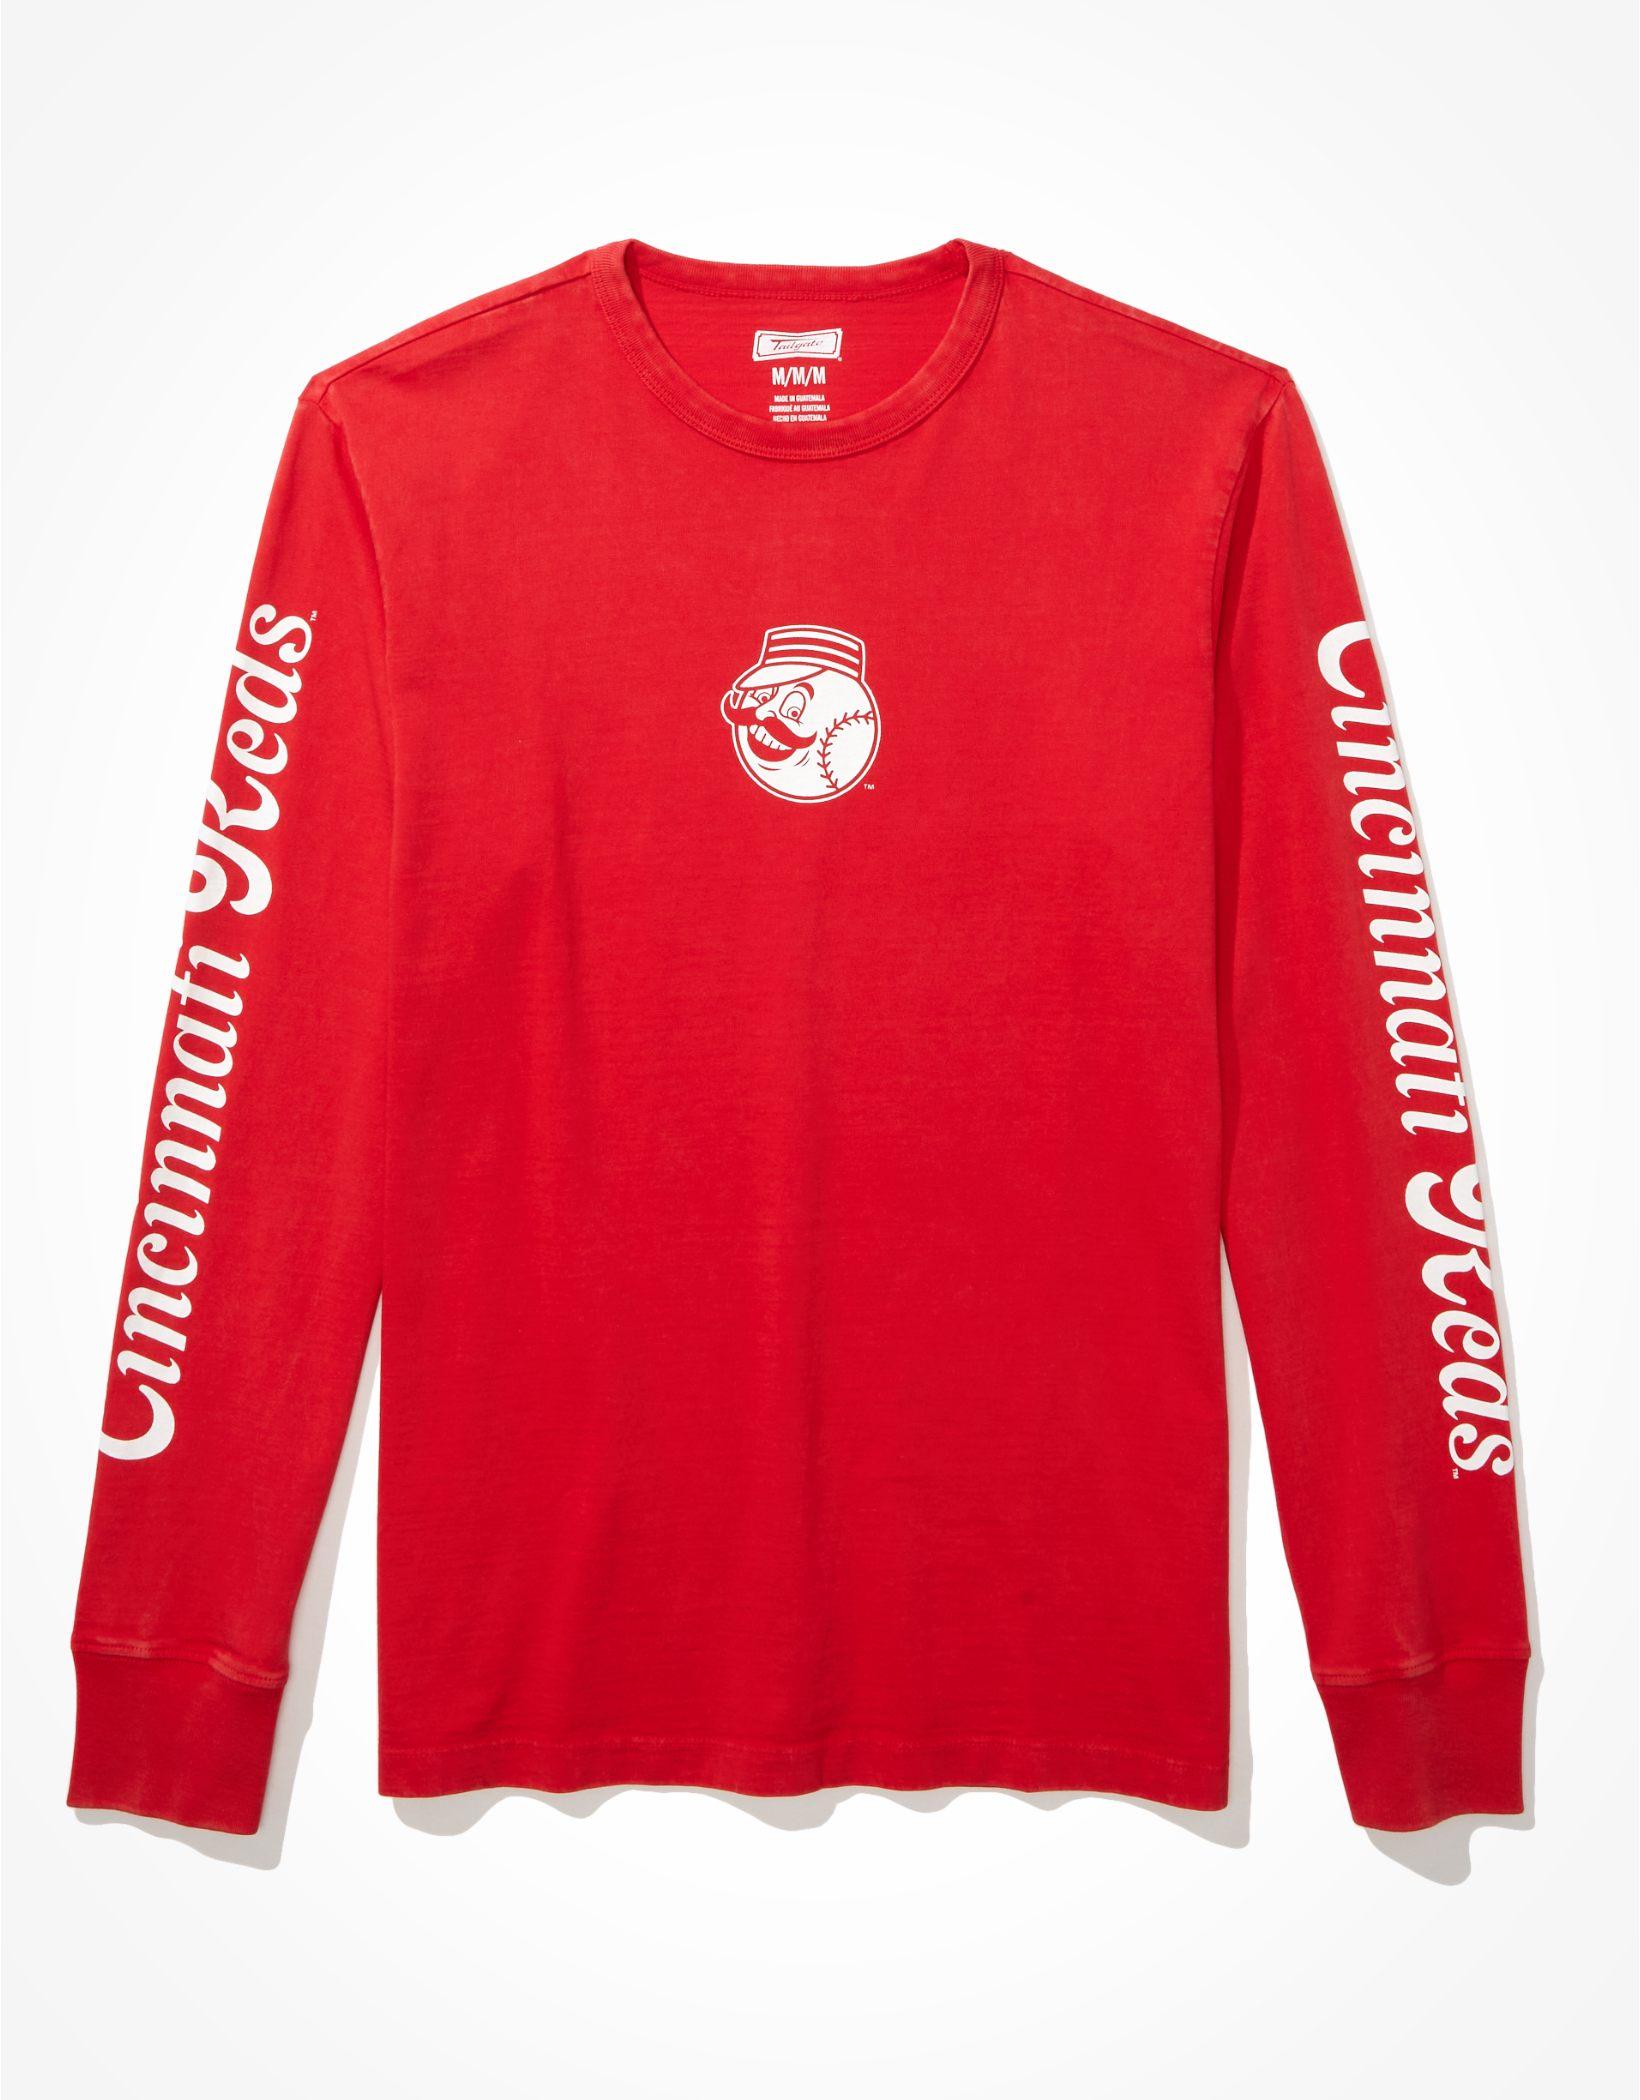 Tailgate Men's Cincinnati Reds Long-Sleeve Graphic T-Shirt